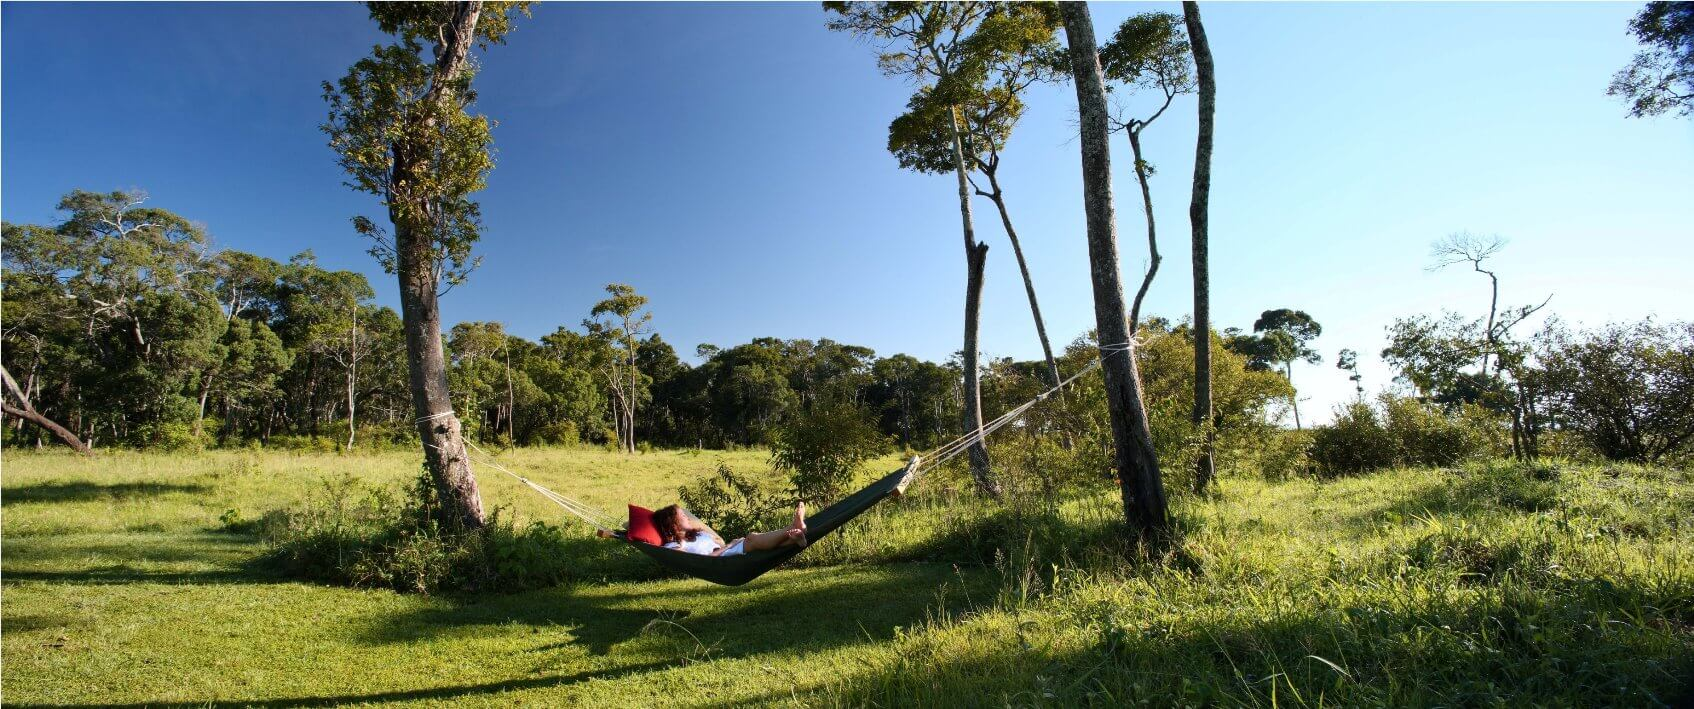 elephant_pepper_camp_honeymoon_tent_-_relaxing_in_hammock